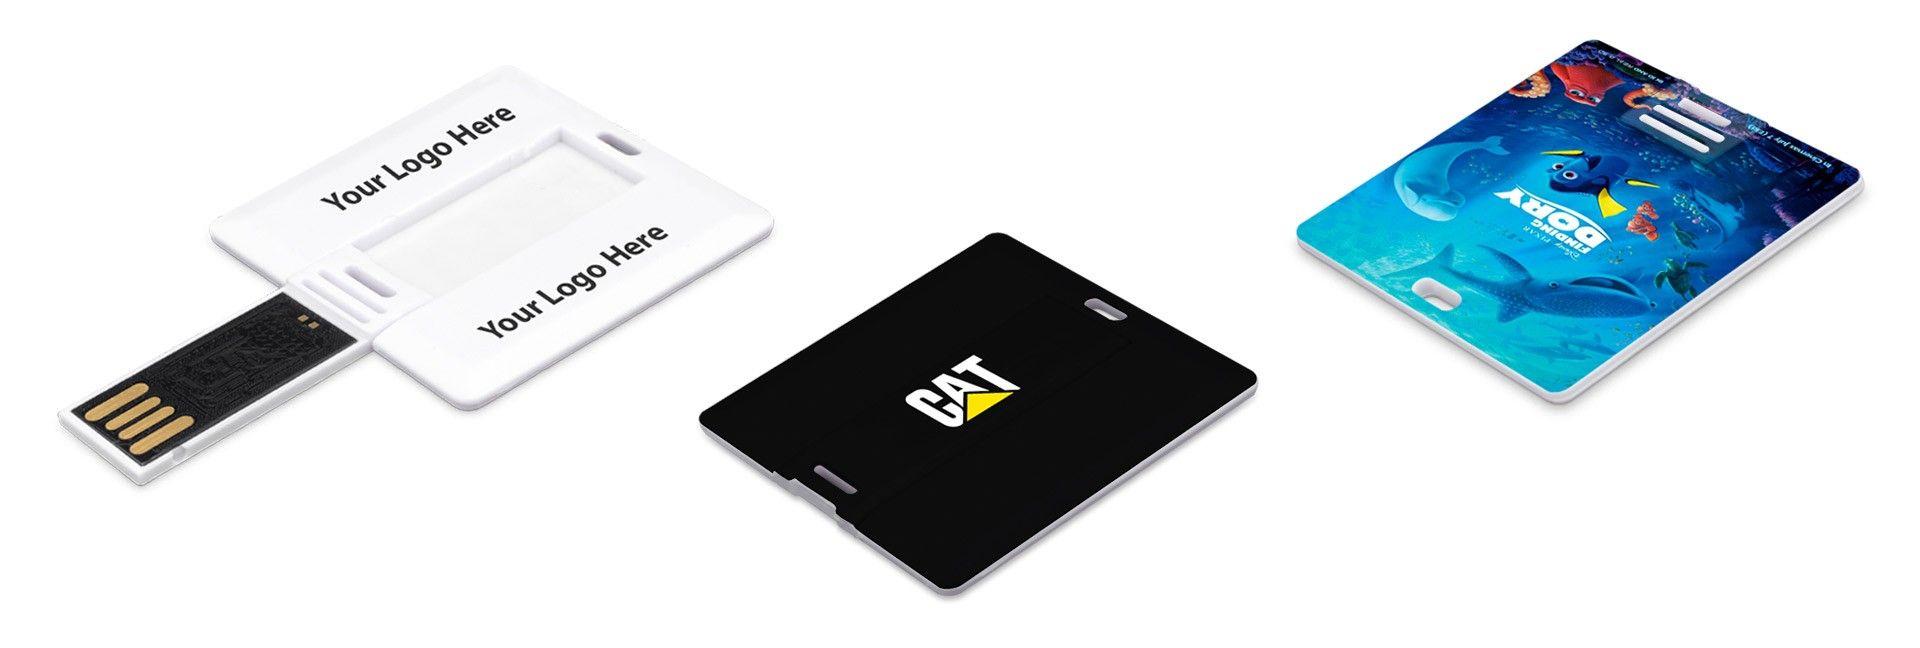 Square Card Usb Flash Drive Square Card Usb Flash Drive Custom Flash Drives